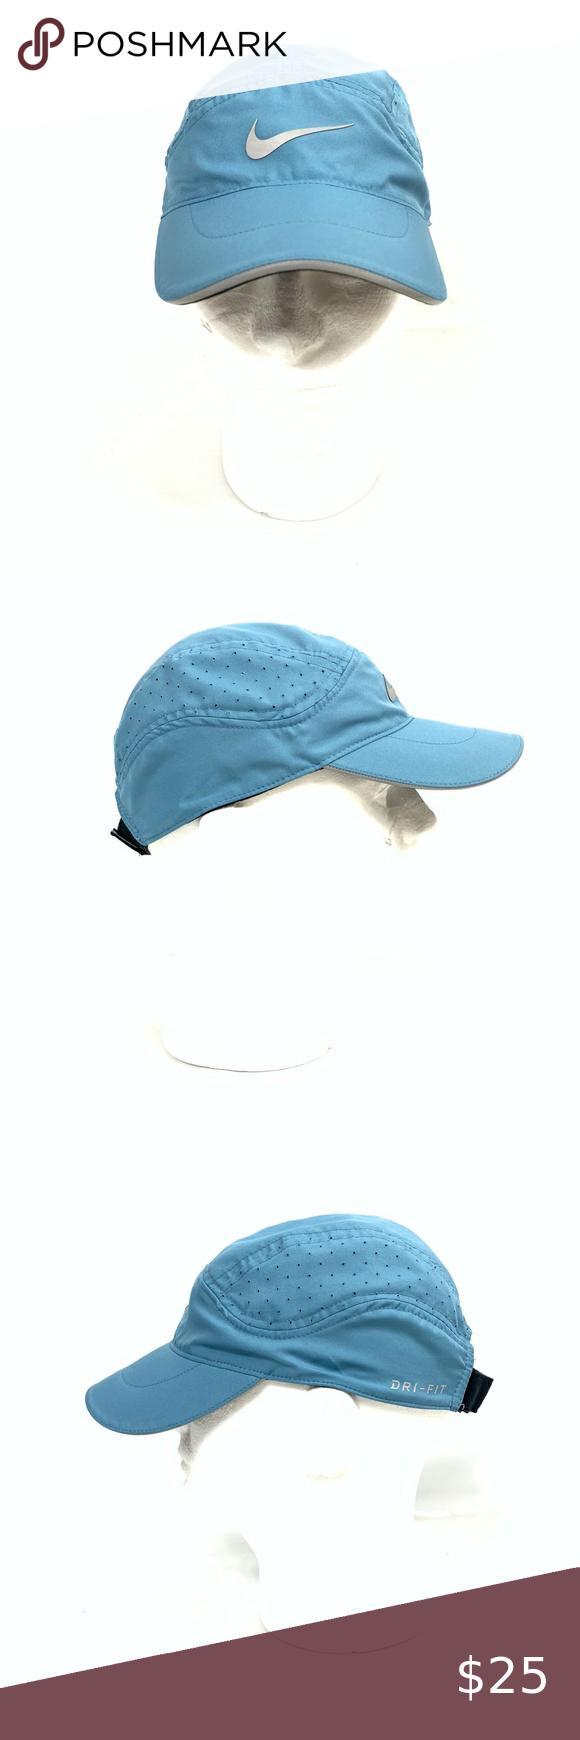 Nike Tailwind Dri Fit Strap Back Baseball Cap Hat Nike Tailwind Nike Accessories Caps Hats